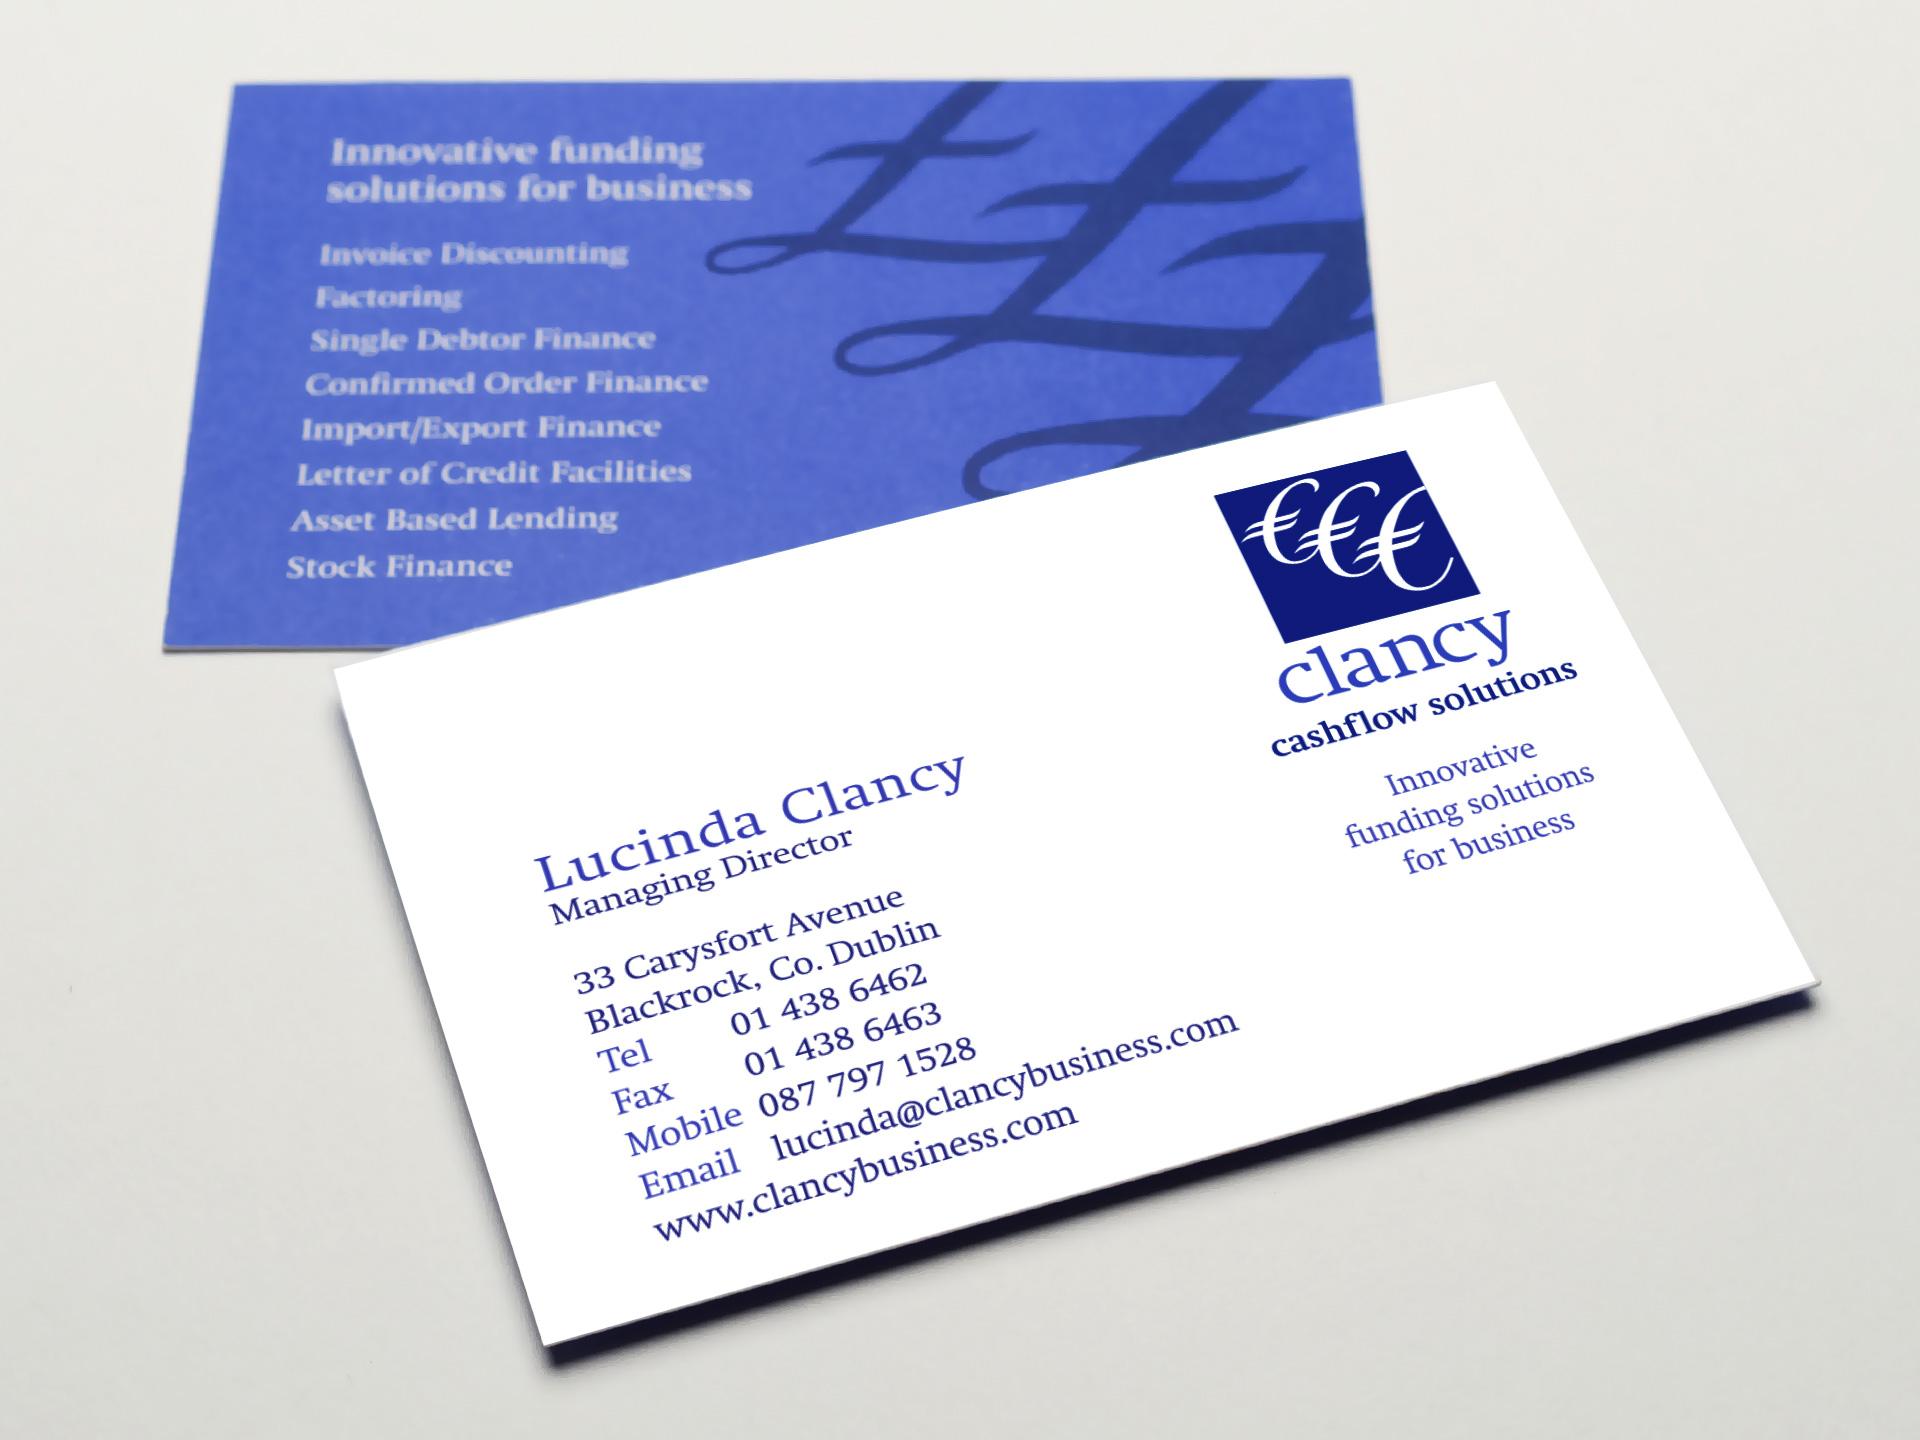 Clancy Cashflow Solutions Brand Identity - Mercer Design